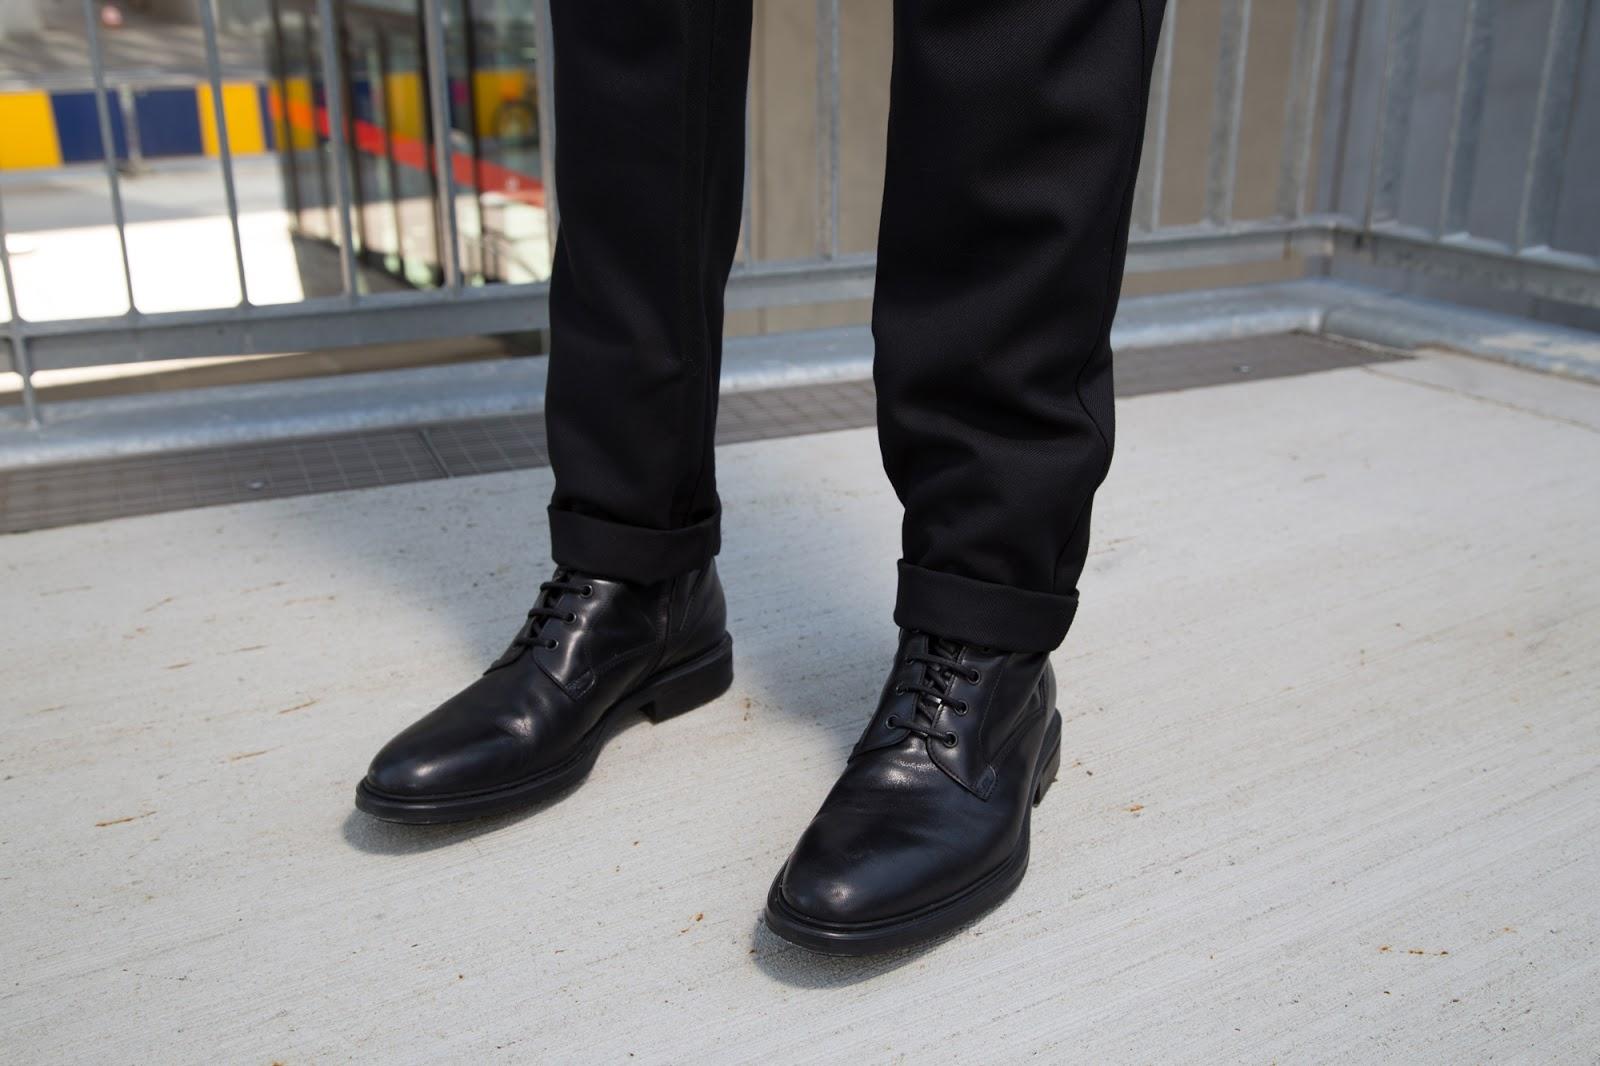 Introducing you Balmain x H&M men's collection + street style guide for Balmain x H&M men's collection written by jonthegold / photography by HOYmedia ( antwerp ) wearing HUGO by hugo boss shoes